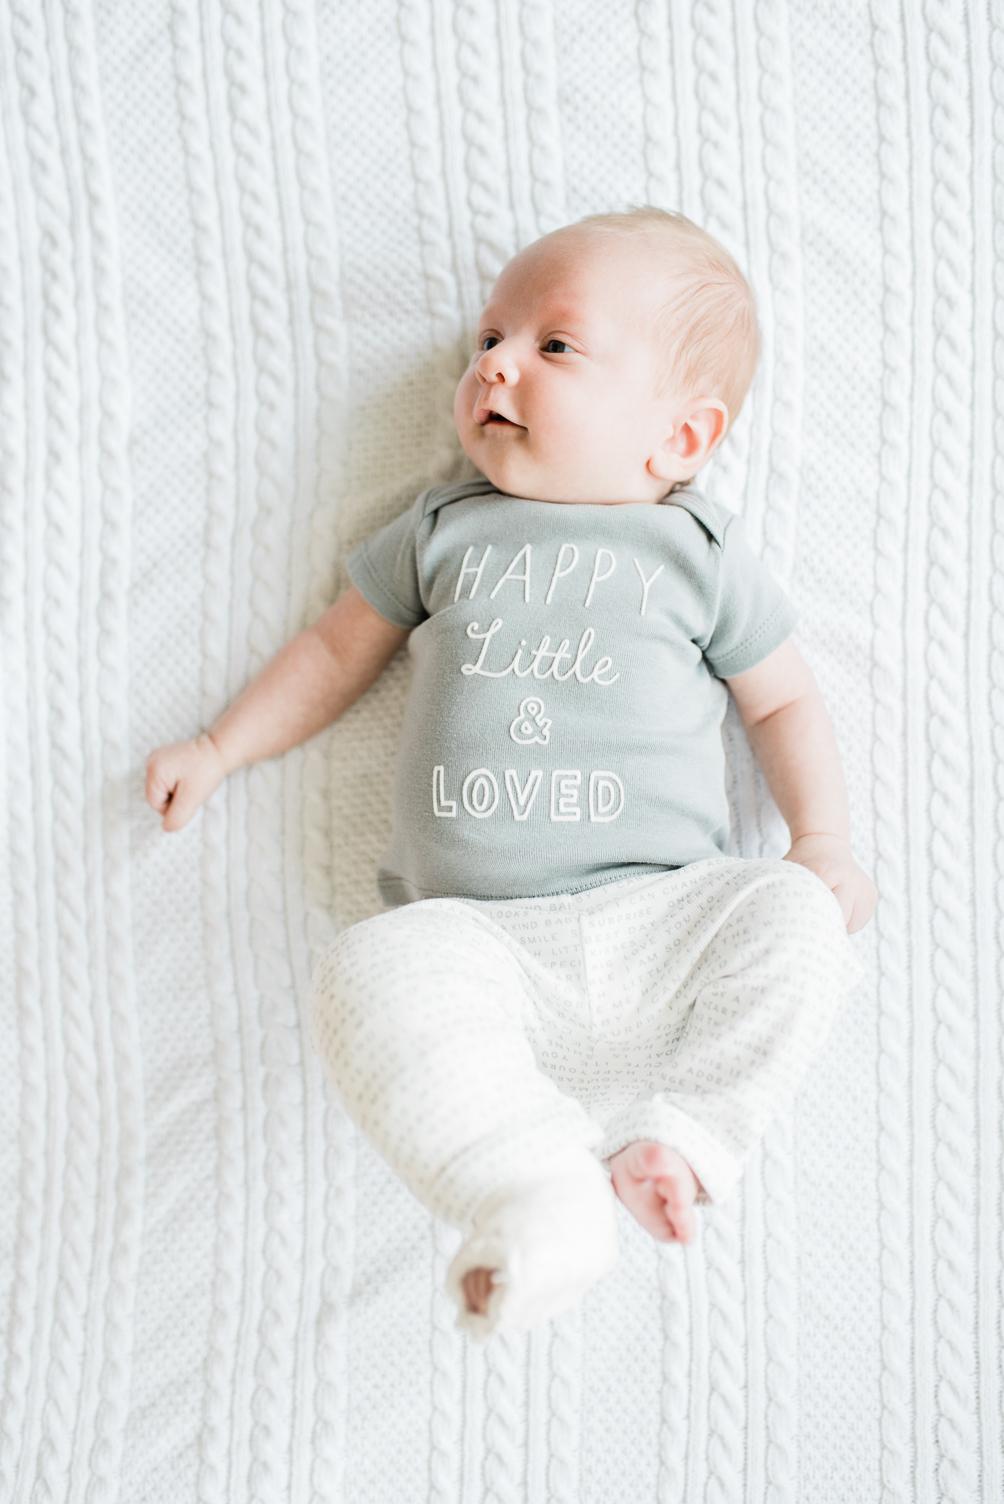 Maryland-Newborn-Lifestyle-photographer-Baltimore-Bel Air-Breanna Kuhlmann.jpg